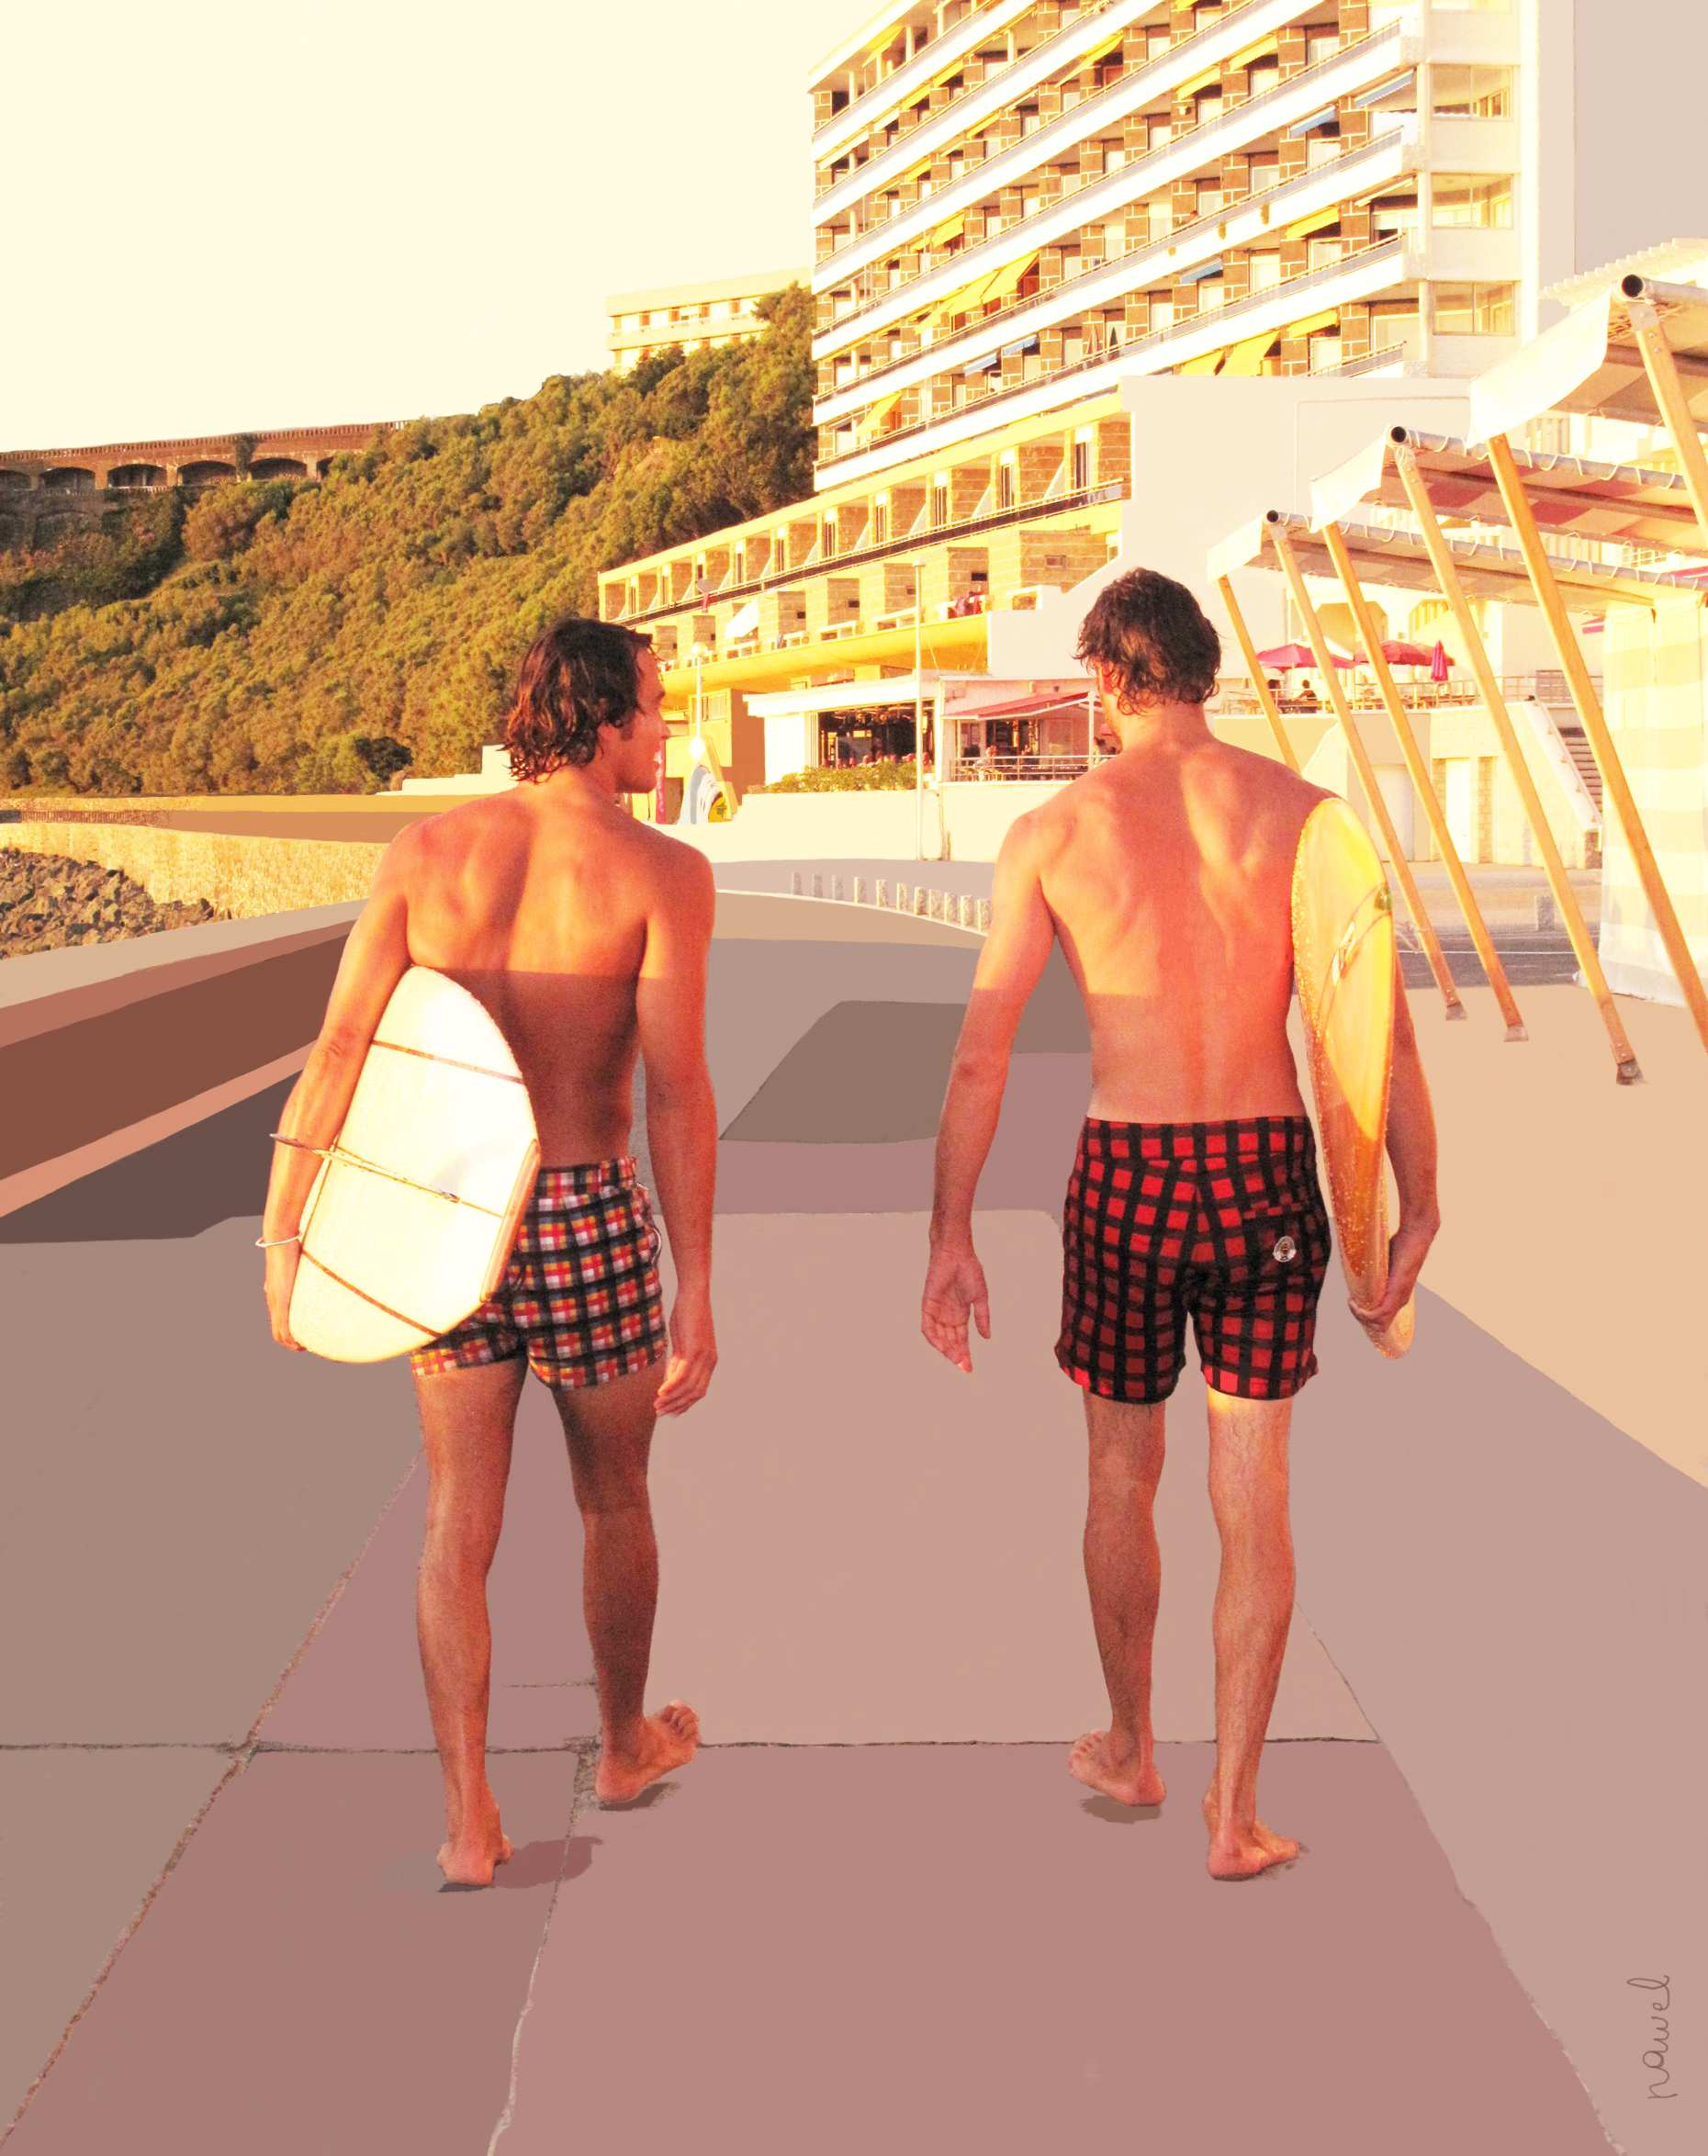 4b5bbdf734 Maillots de bain homme 2011 : Robinson les bains s'inspire du Pays Basque